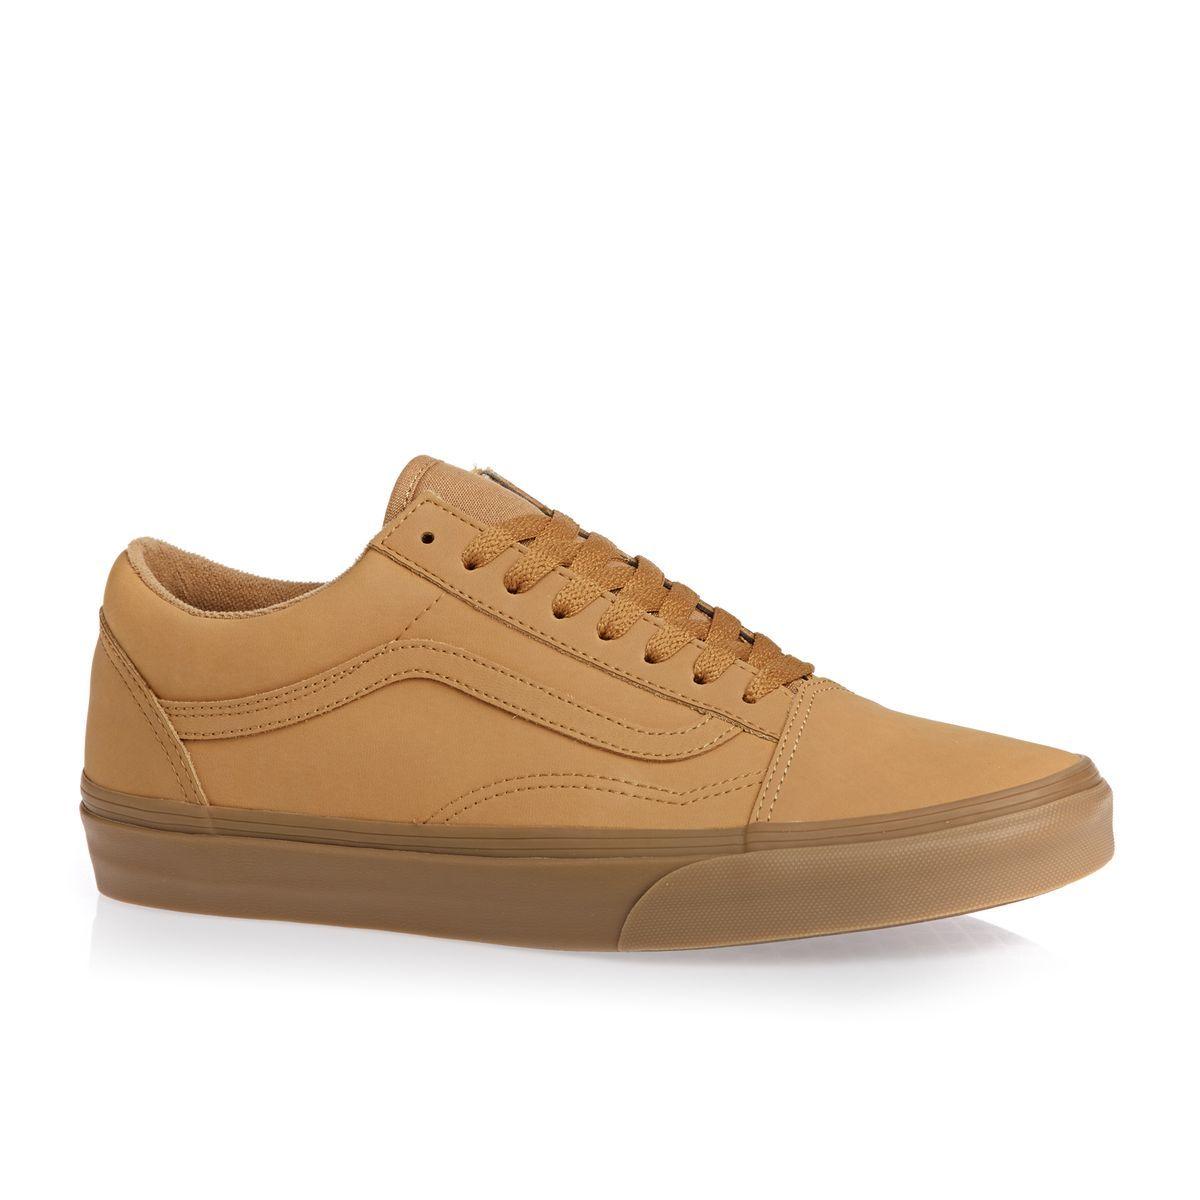 0b7bacad82 Vans Skate Shoes - Vans Old Skool Shoes - Light Gum Mono